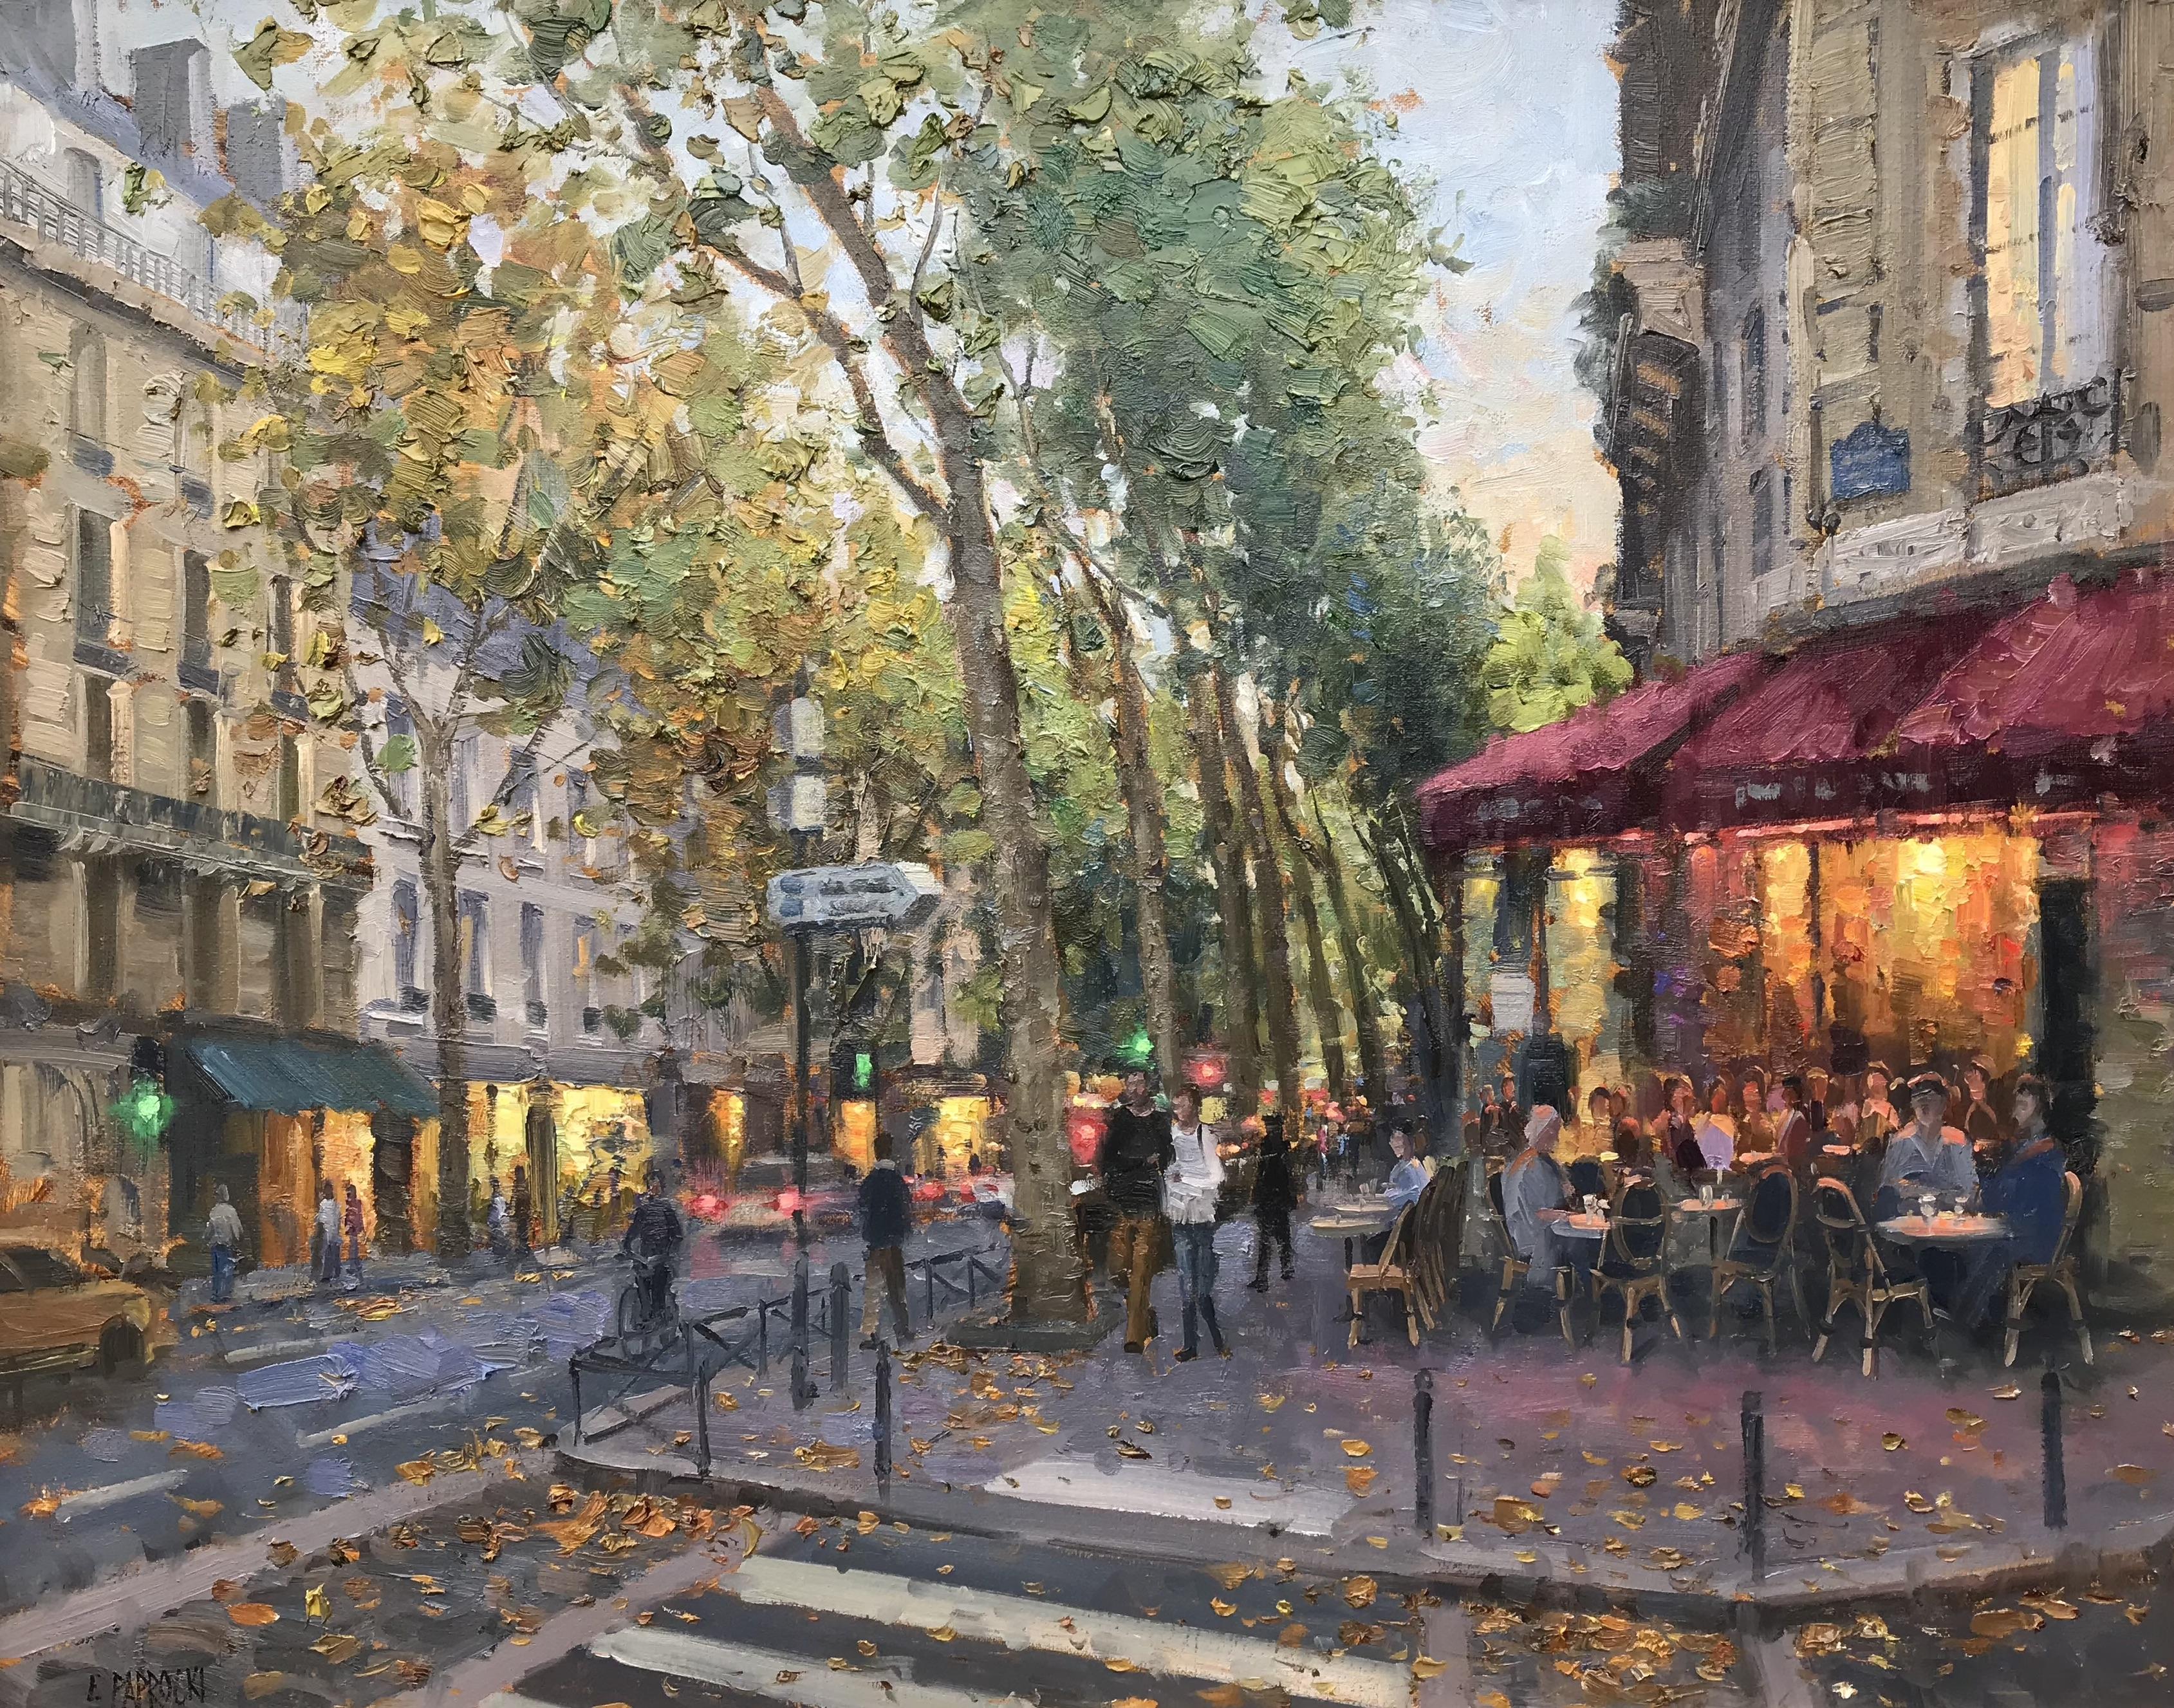 Paris Corner, St. Germain